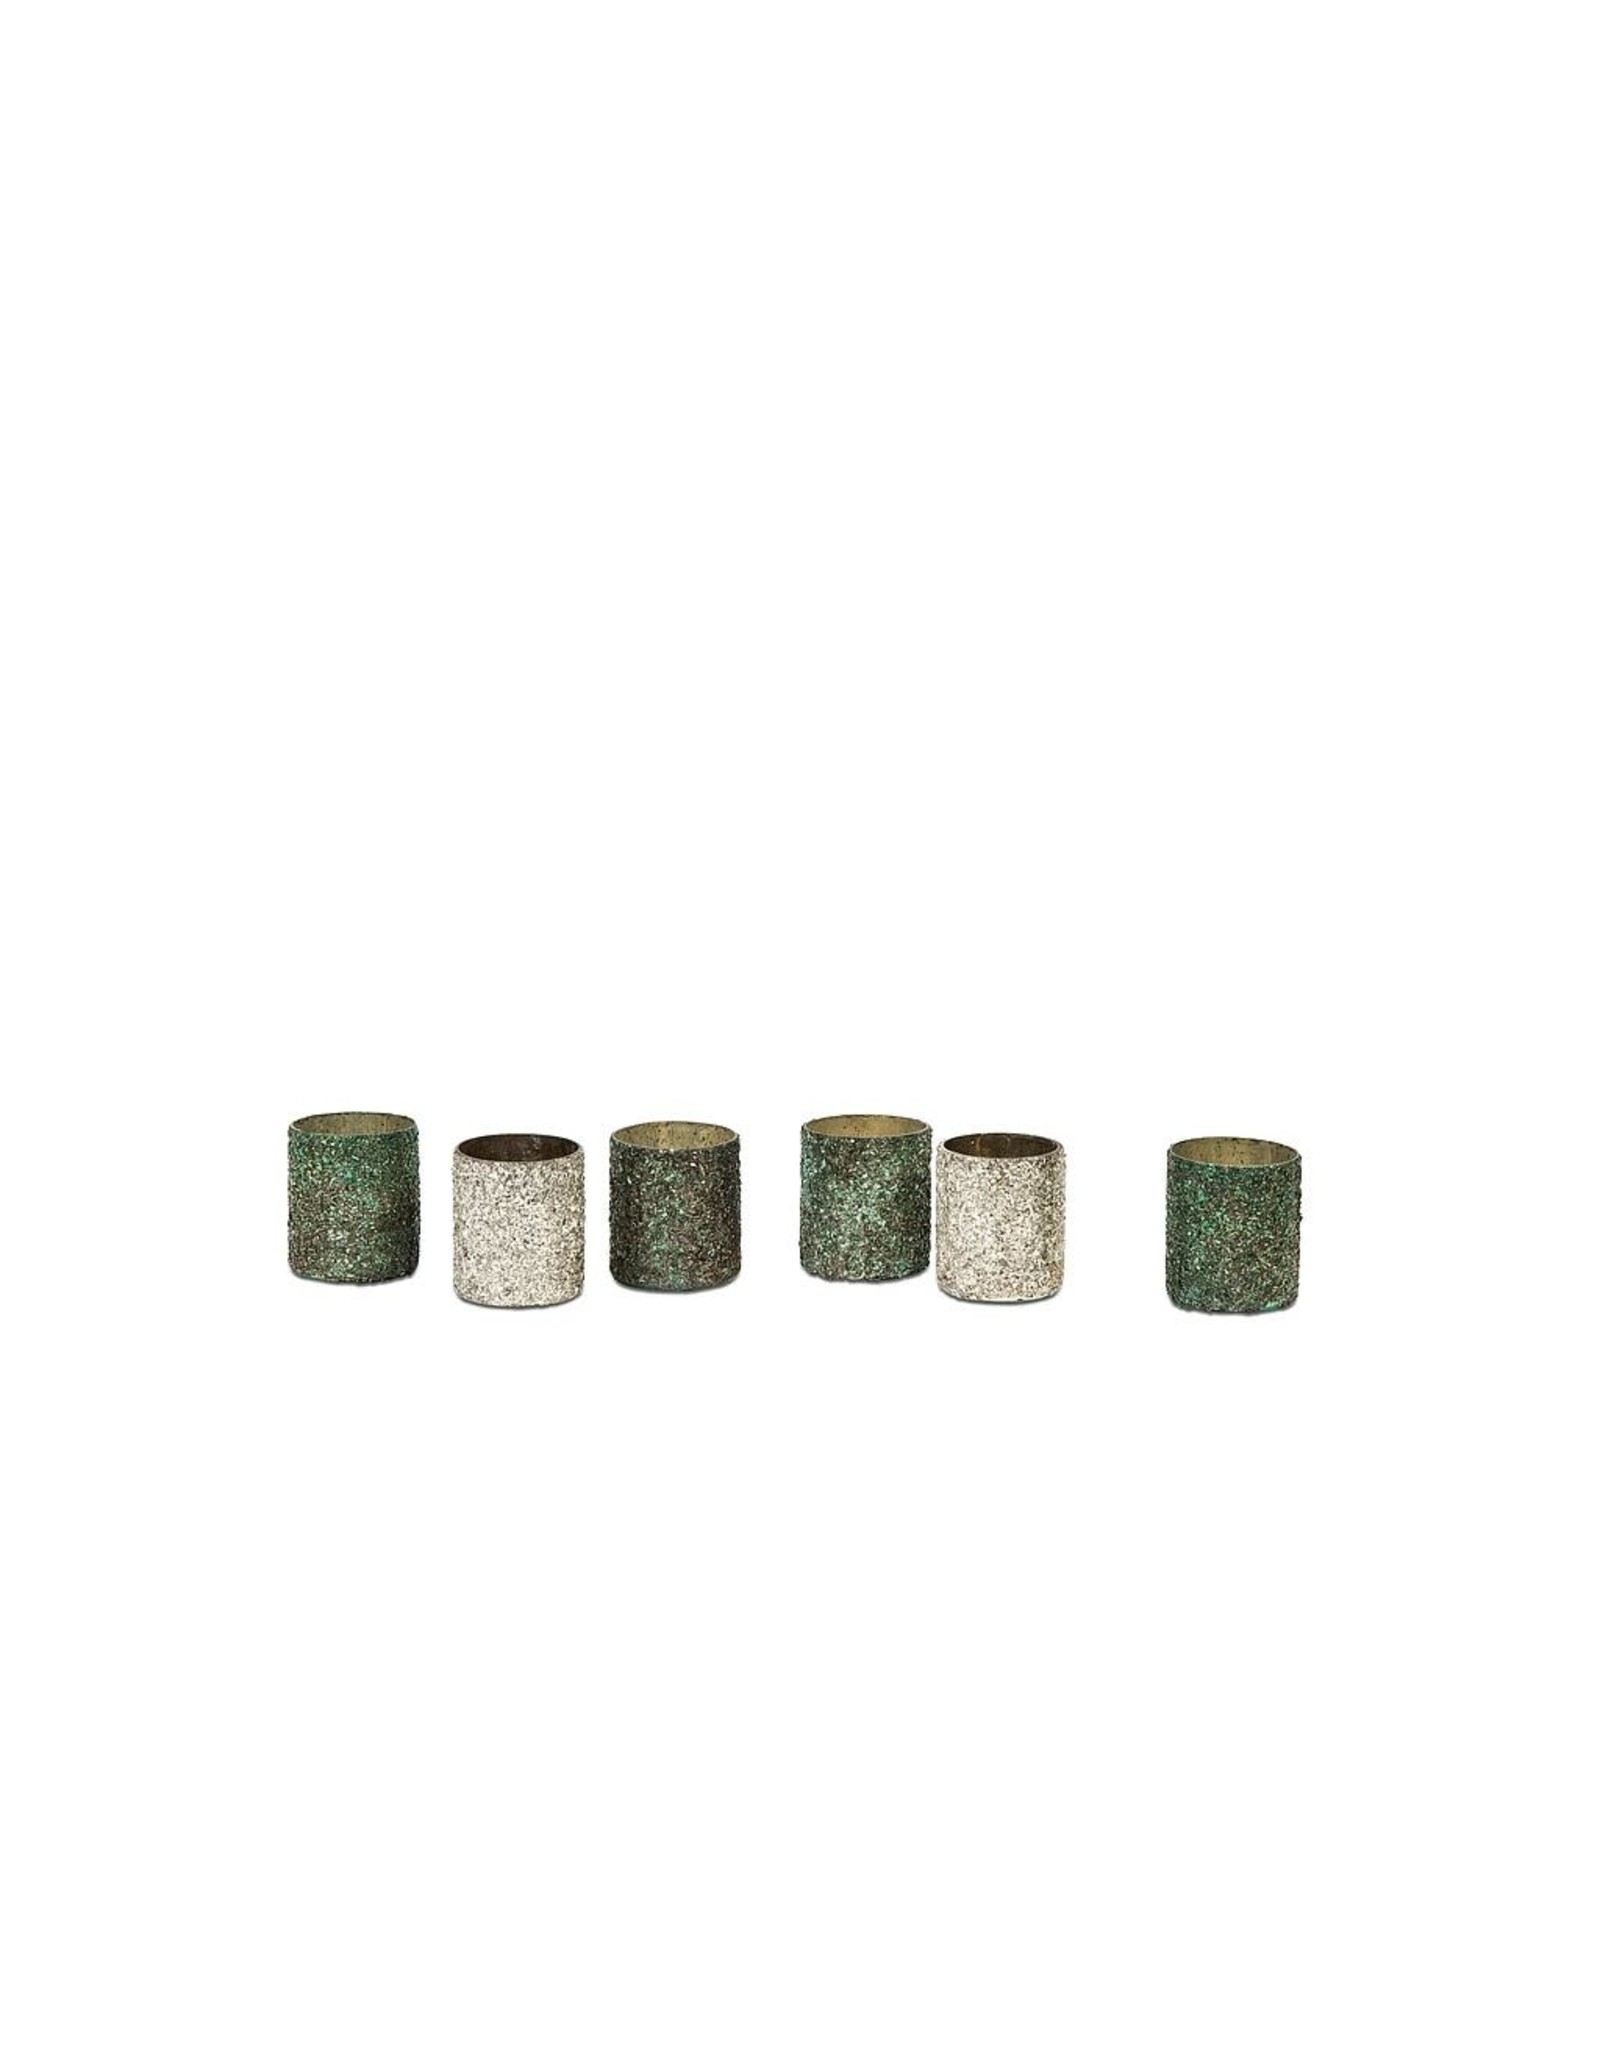 Dekocandle Tlight Flake Mosaic - glass - Shiny Green copper - 7x8cm